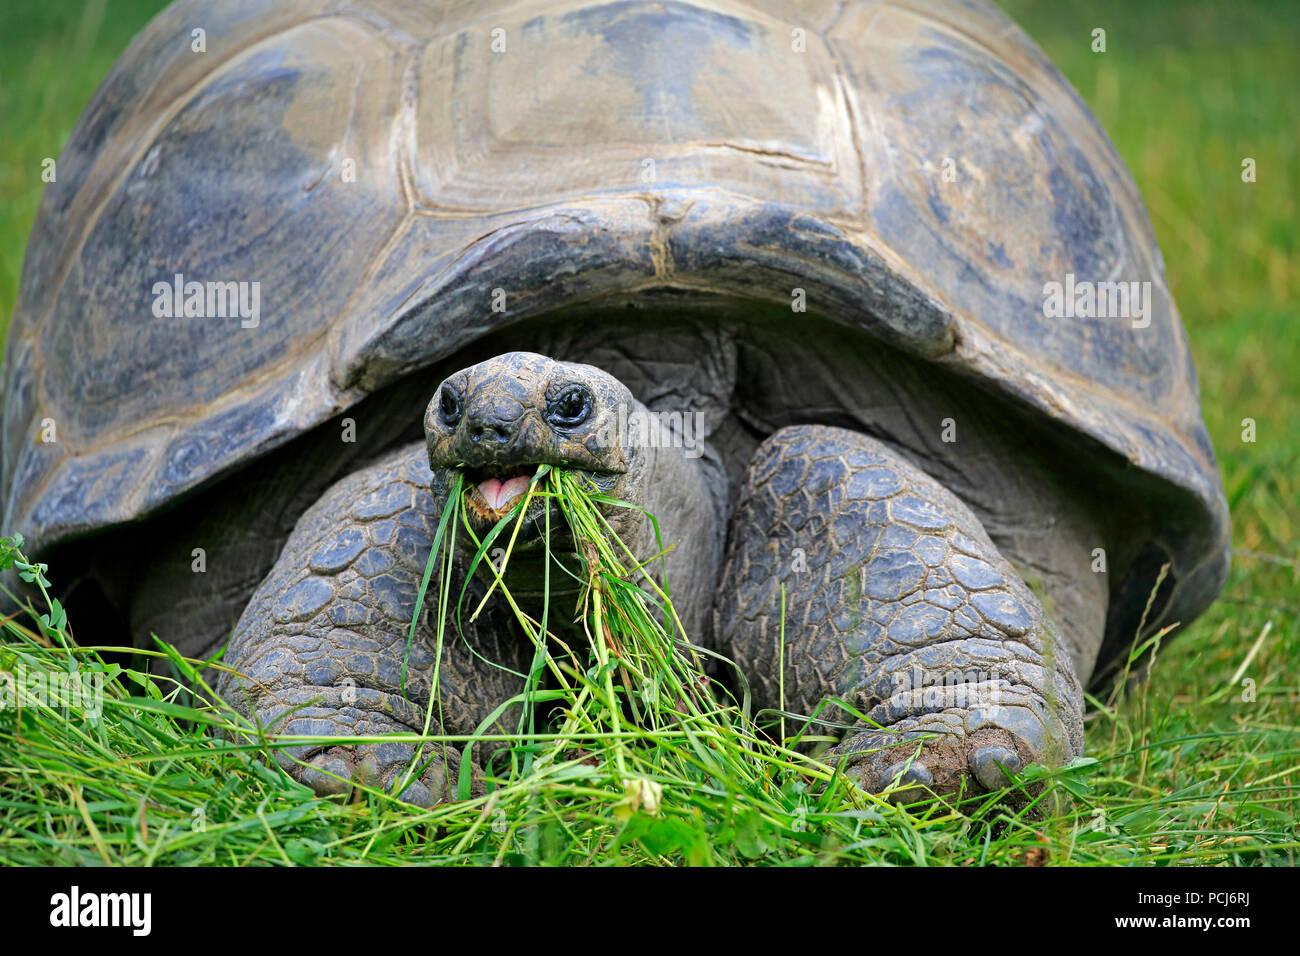 Seychelles giant tortoise, adult feeding, Seychelles, Africa, (Aldabrachelys gigantea) - Stock Image